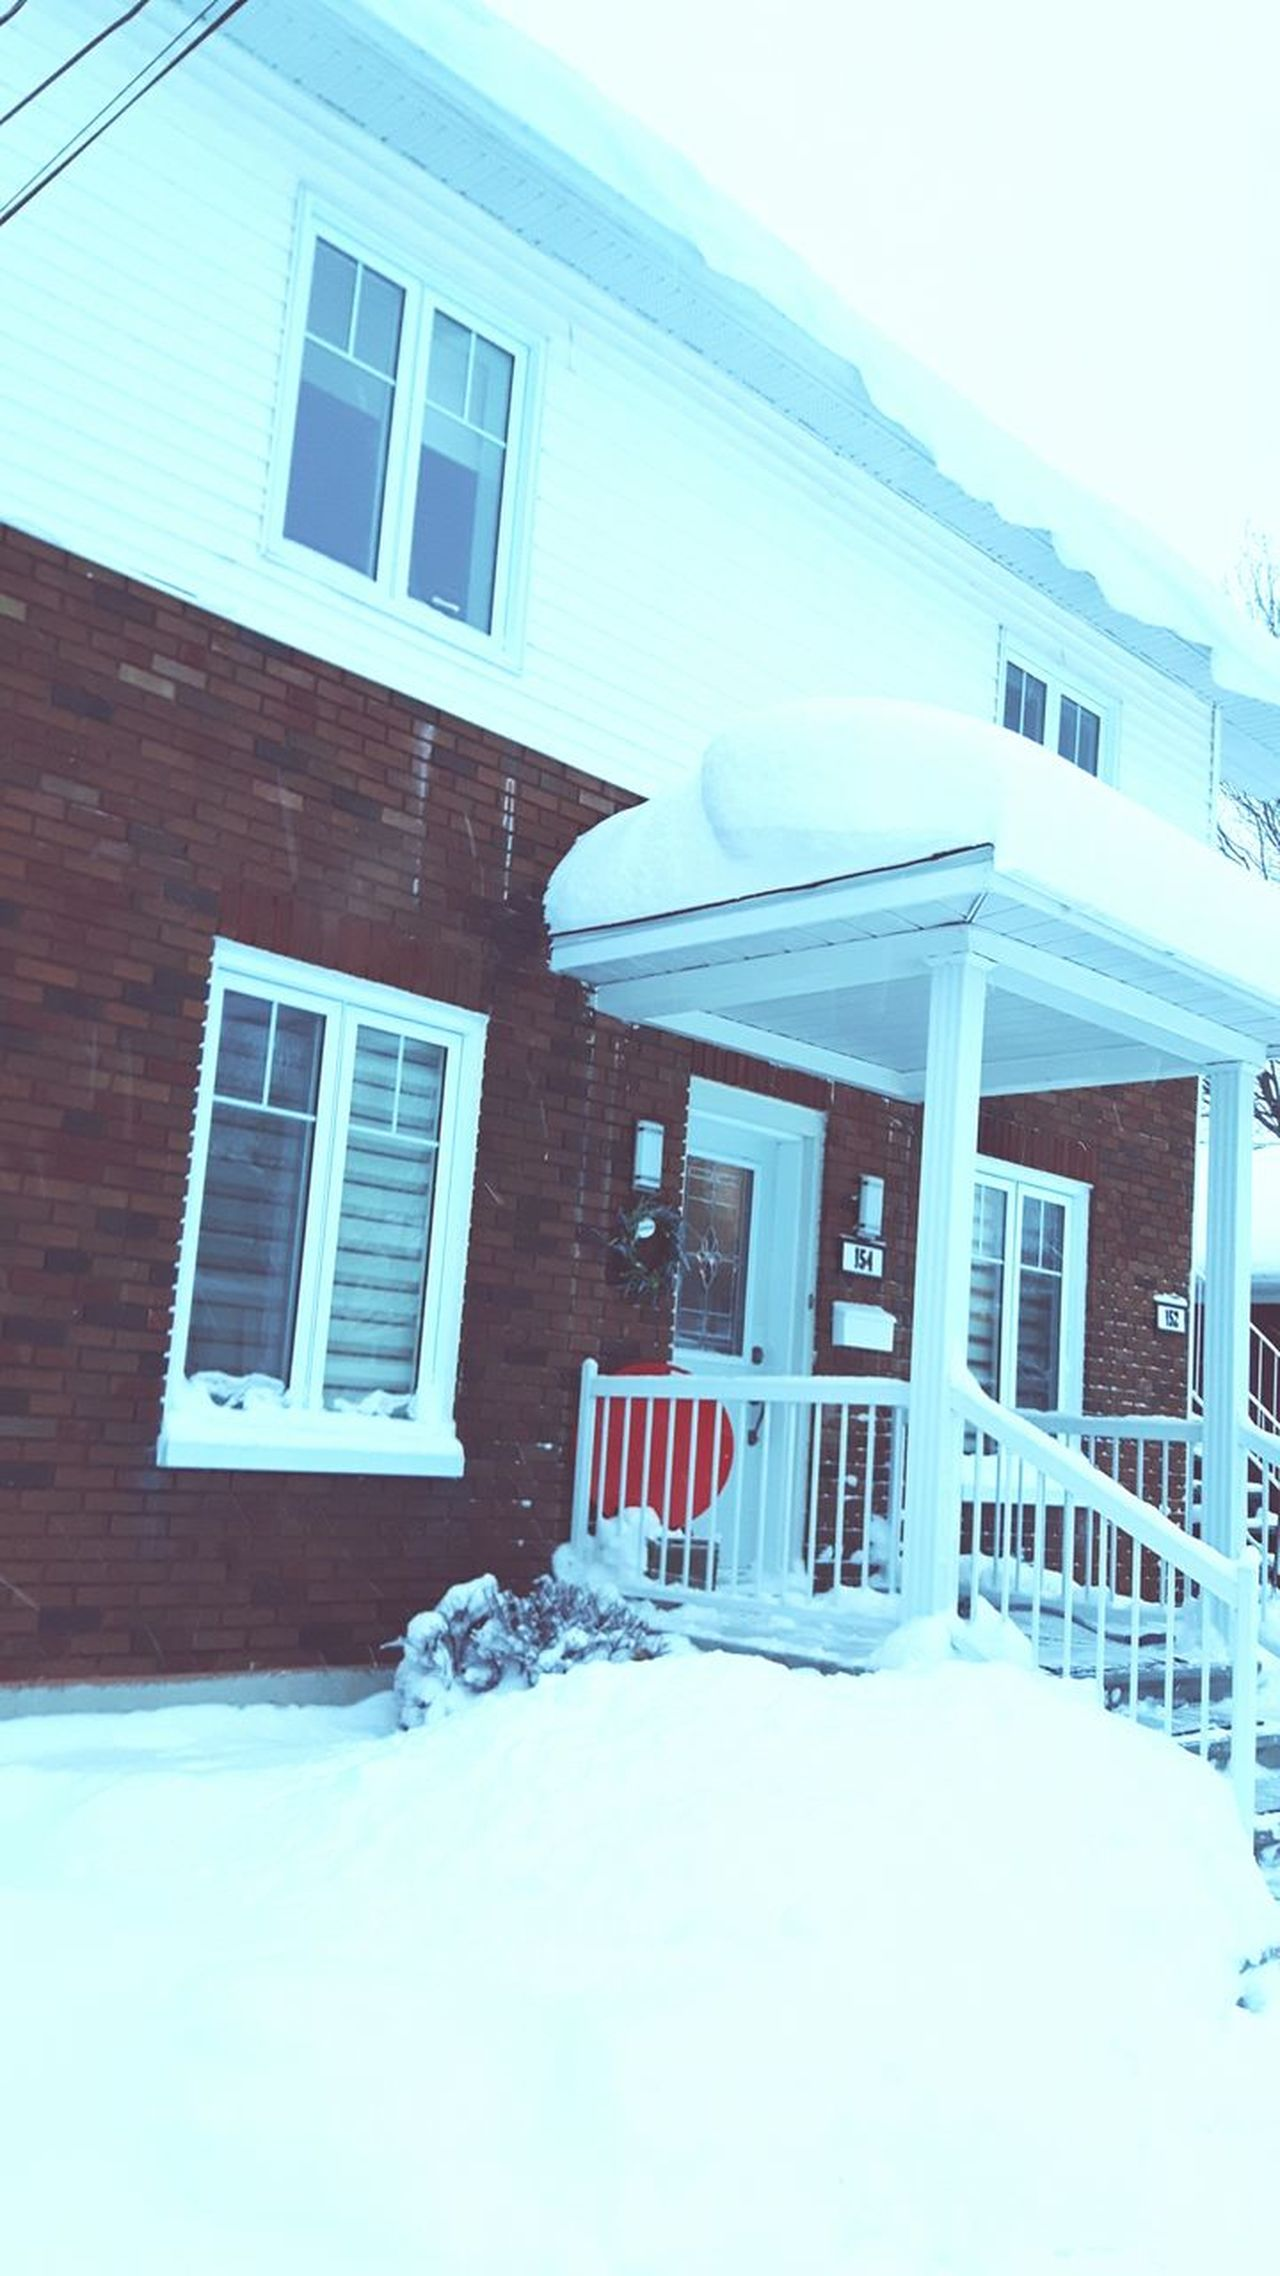 Snow Building Exterior Winter Snowing Cold Temperature Frozen Neige Storm Snowstorm Snow Day Stella Granby Canada Quebec Estrie Cantons De L'est